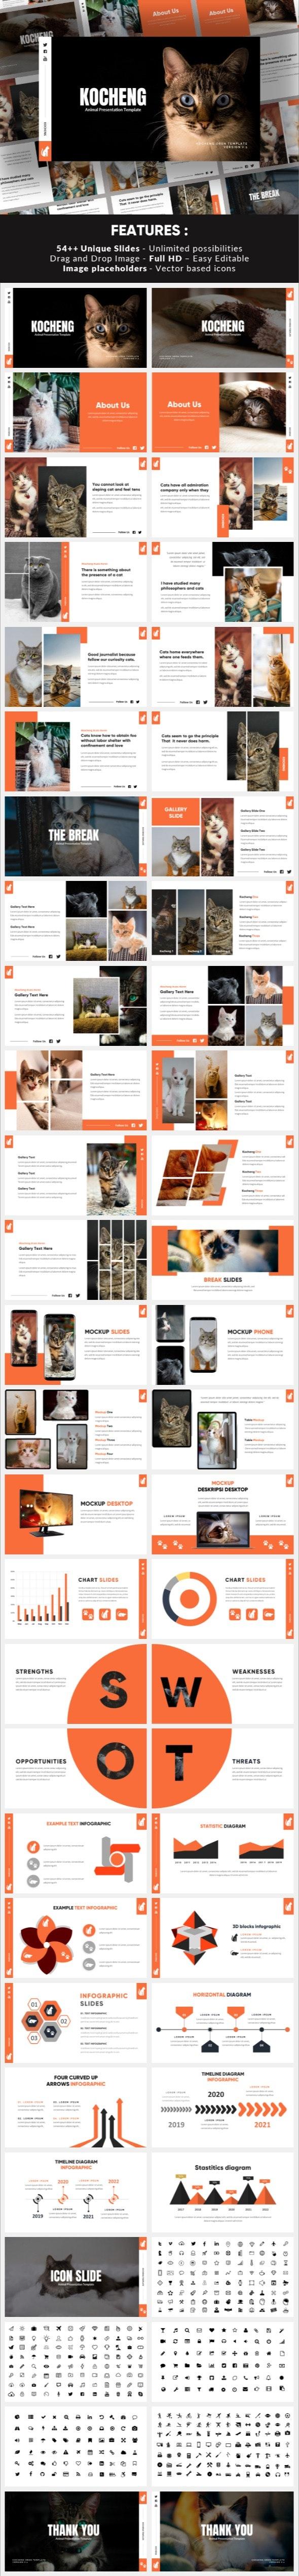 Kocheng - Cat Animal Keynote Template - Miscellaneous Keynote Templates